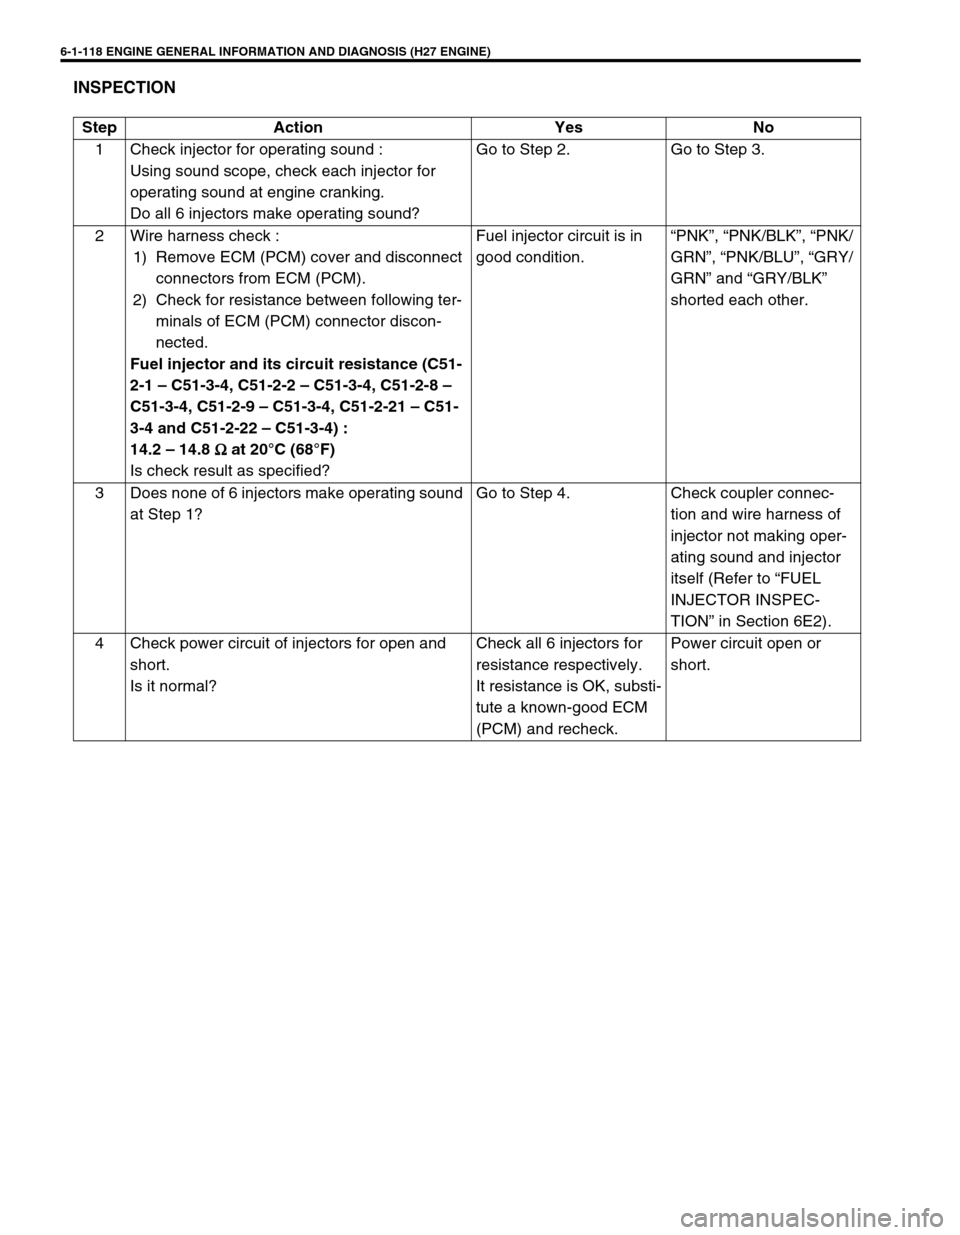 Check Engine Suzuki Grand Vitara 2001 2g Owners Manual Wiring Harness Page 279